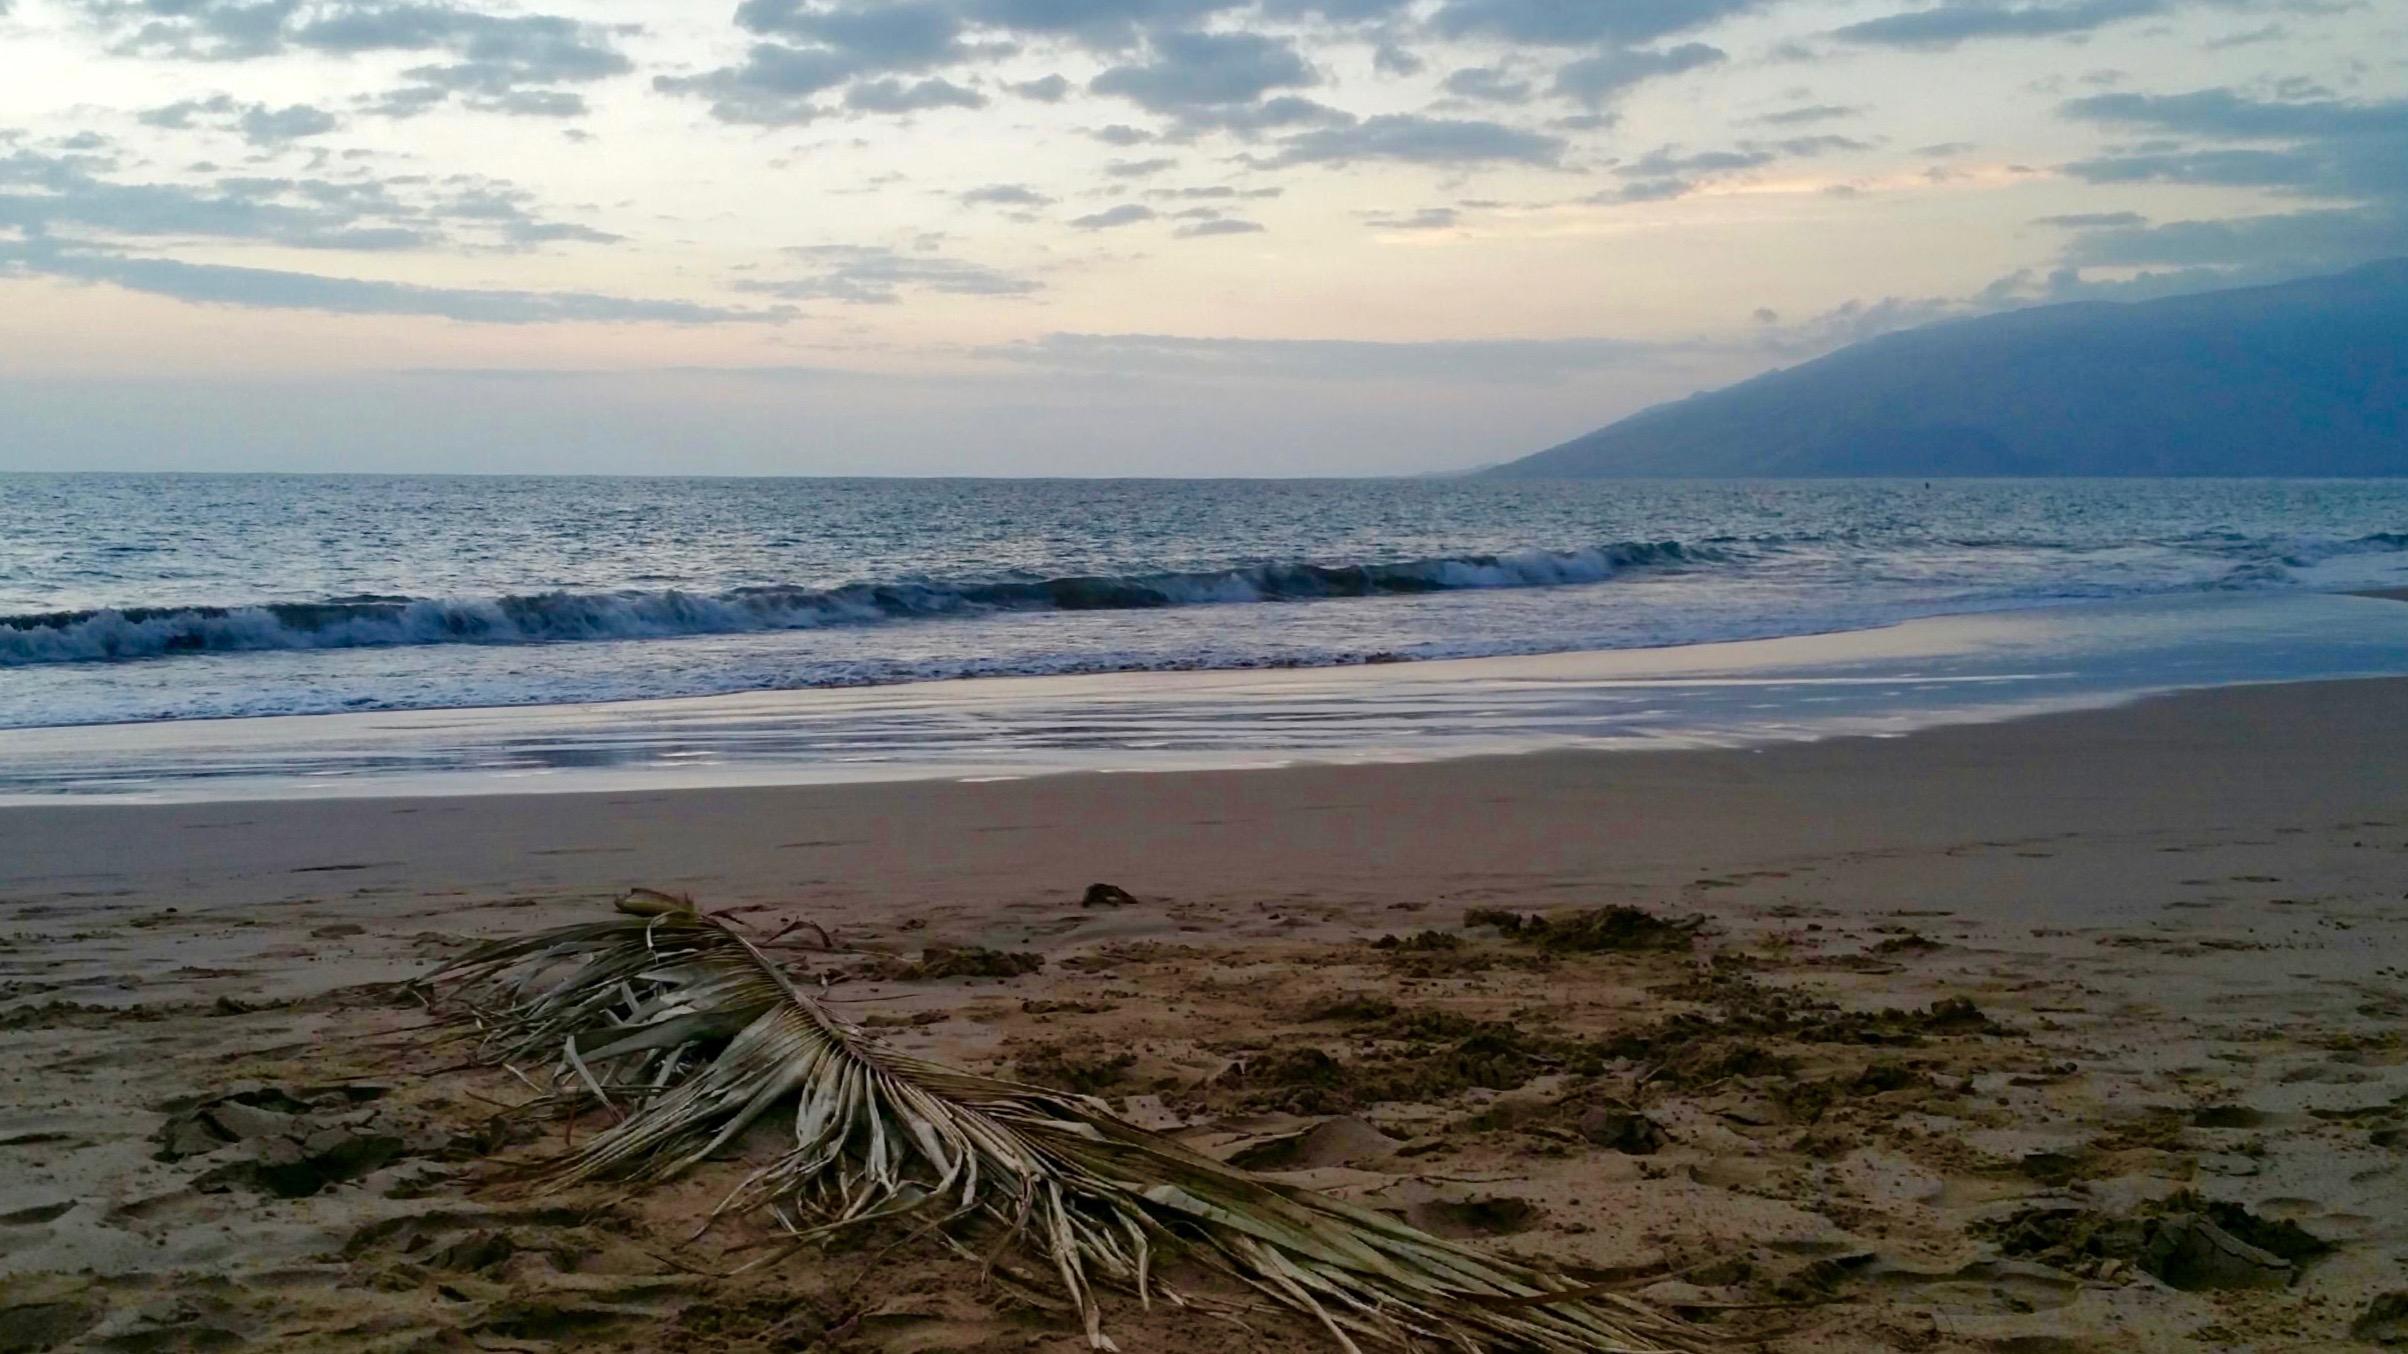 Kama'ole Beach 1